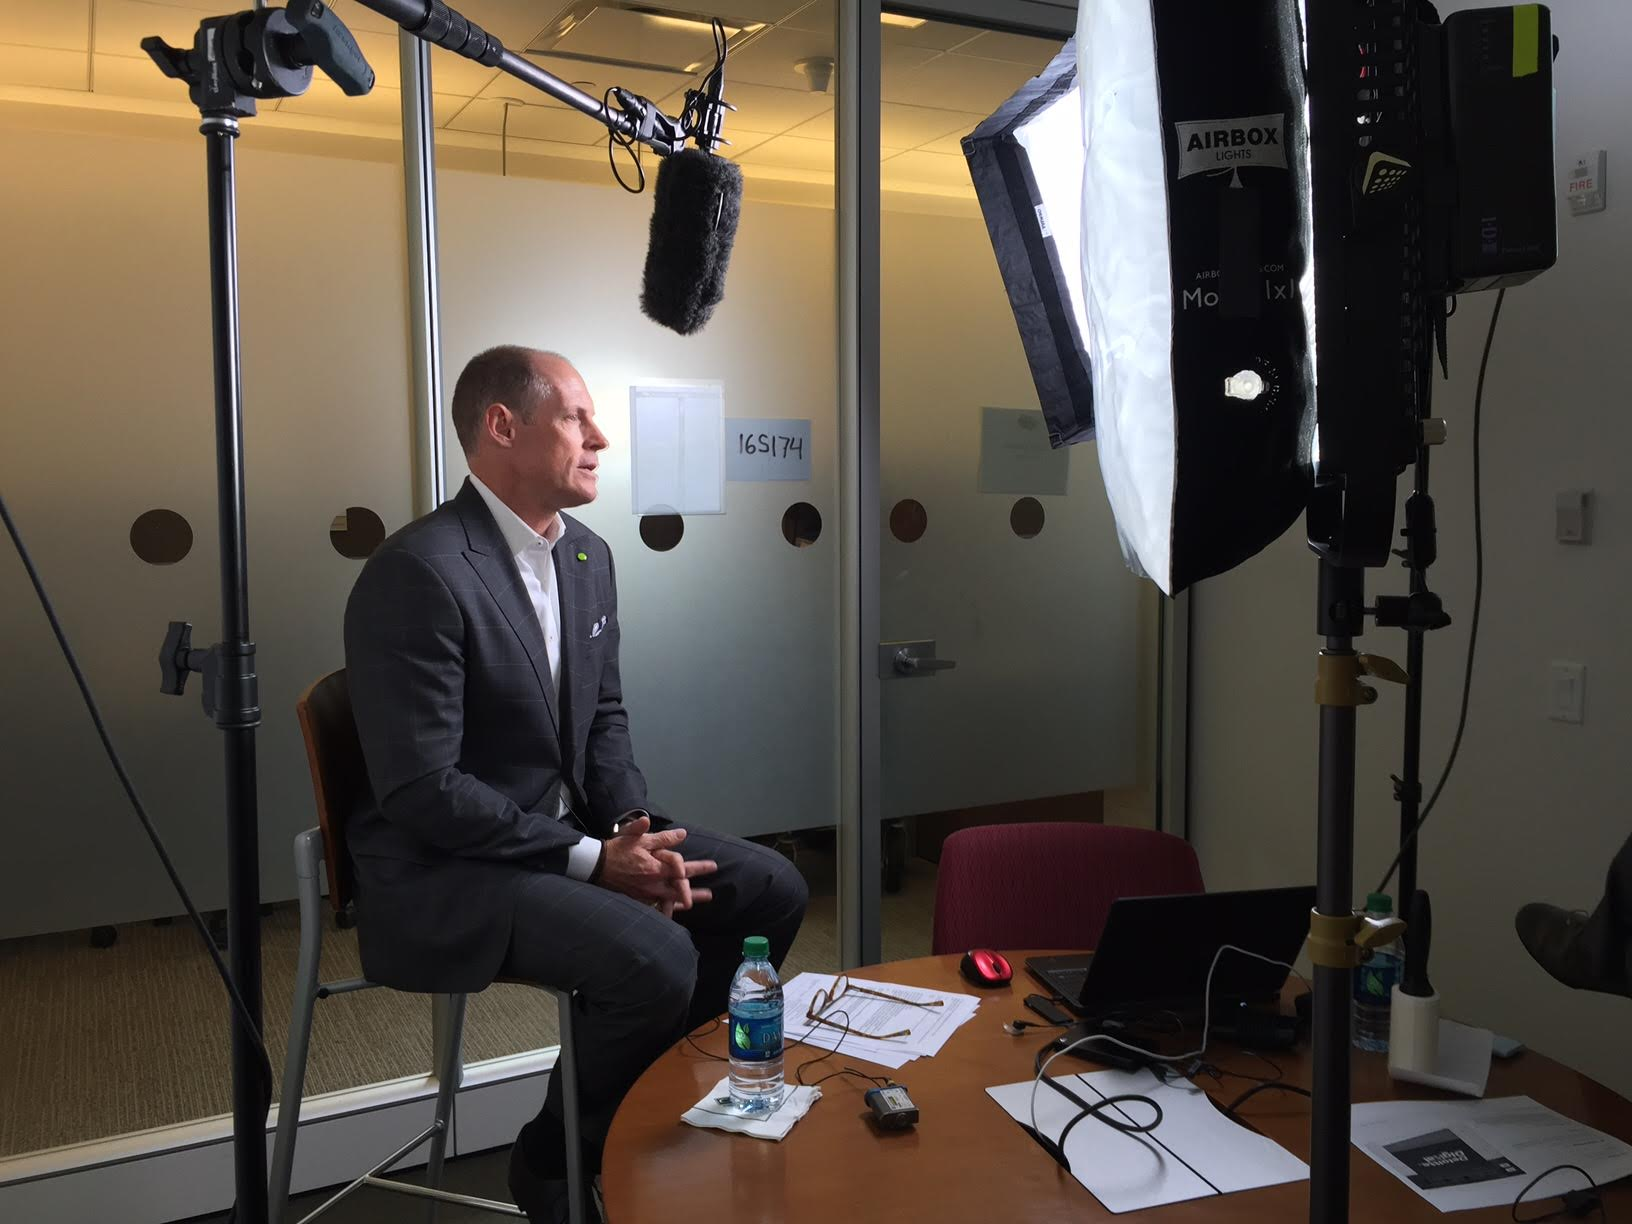 d 1 Nashville Crew Films Forensic & Investigations Leader for Deloitte